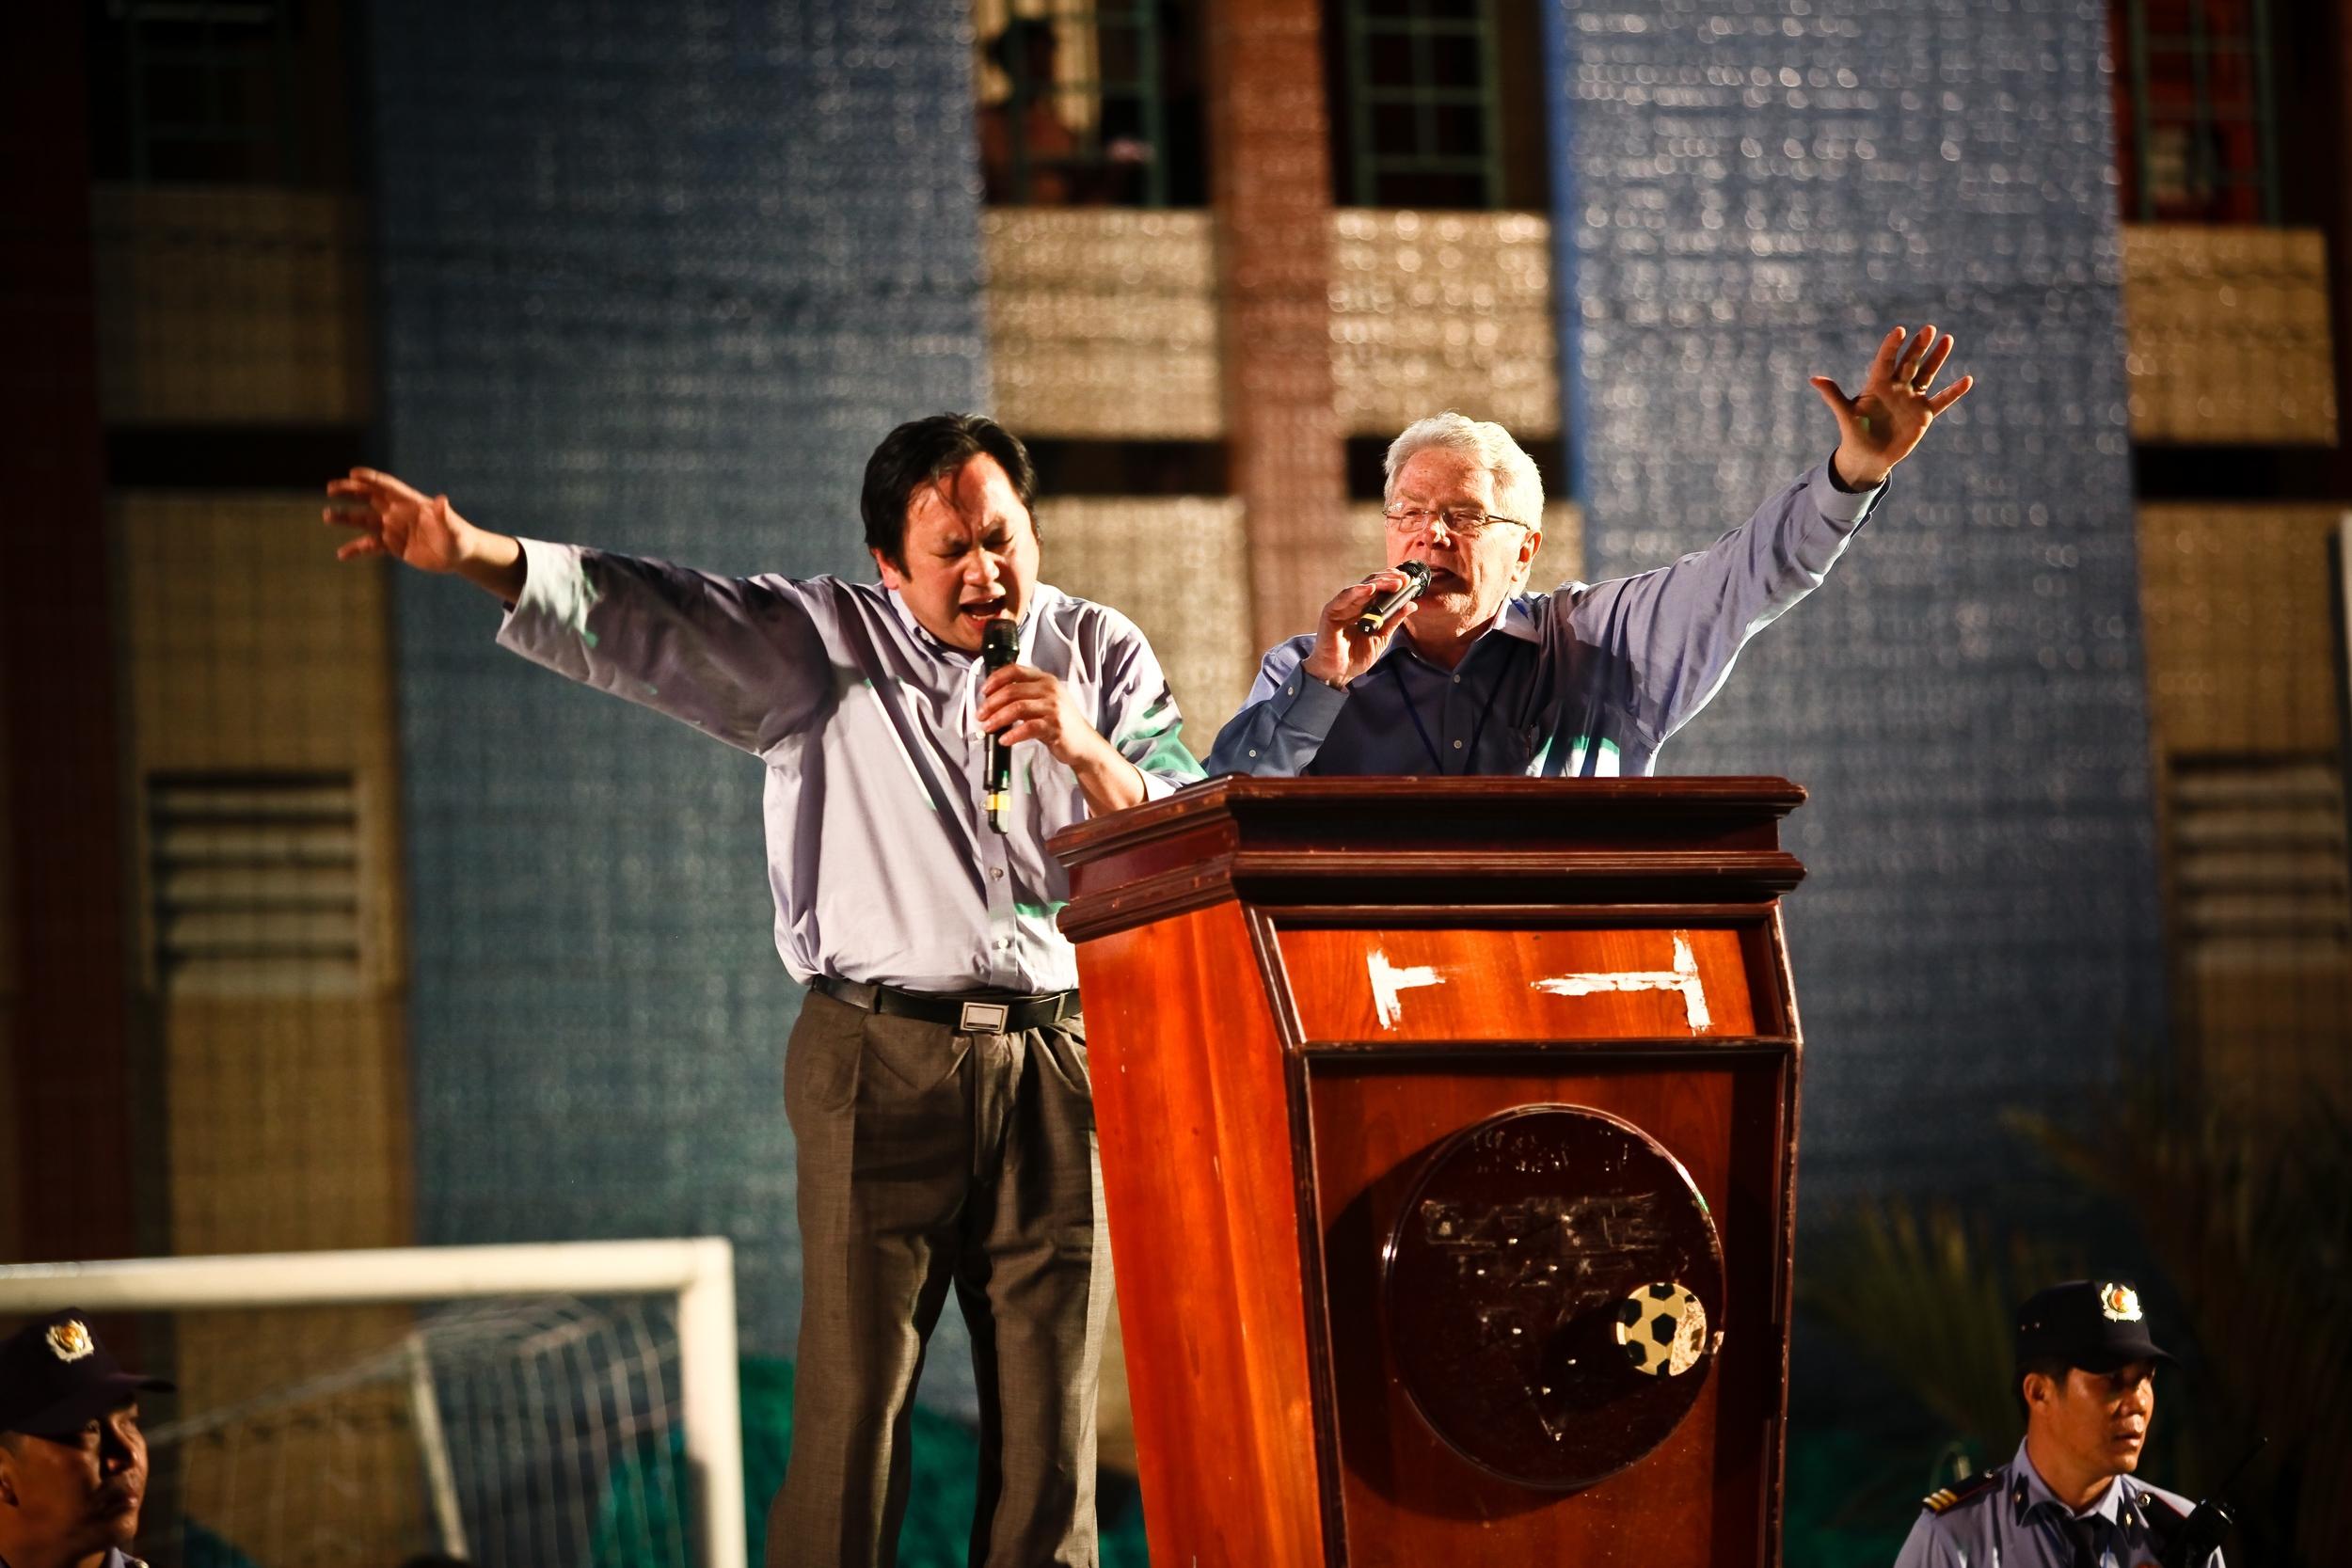 Luis Preaching in Vietnam, 2011